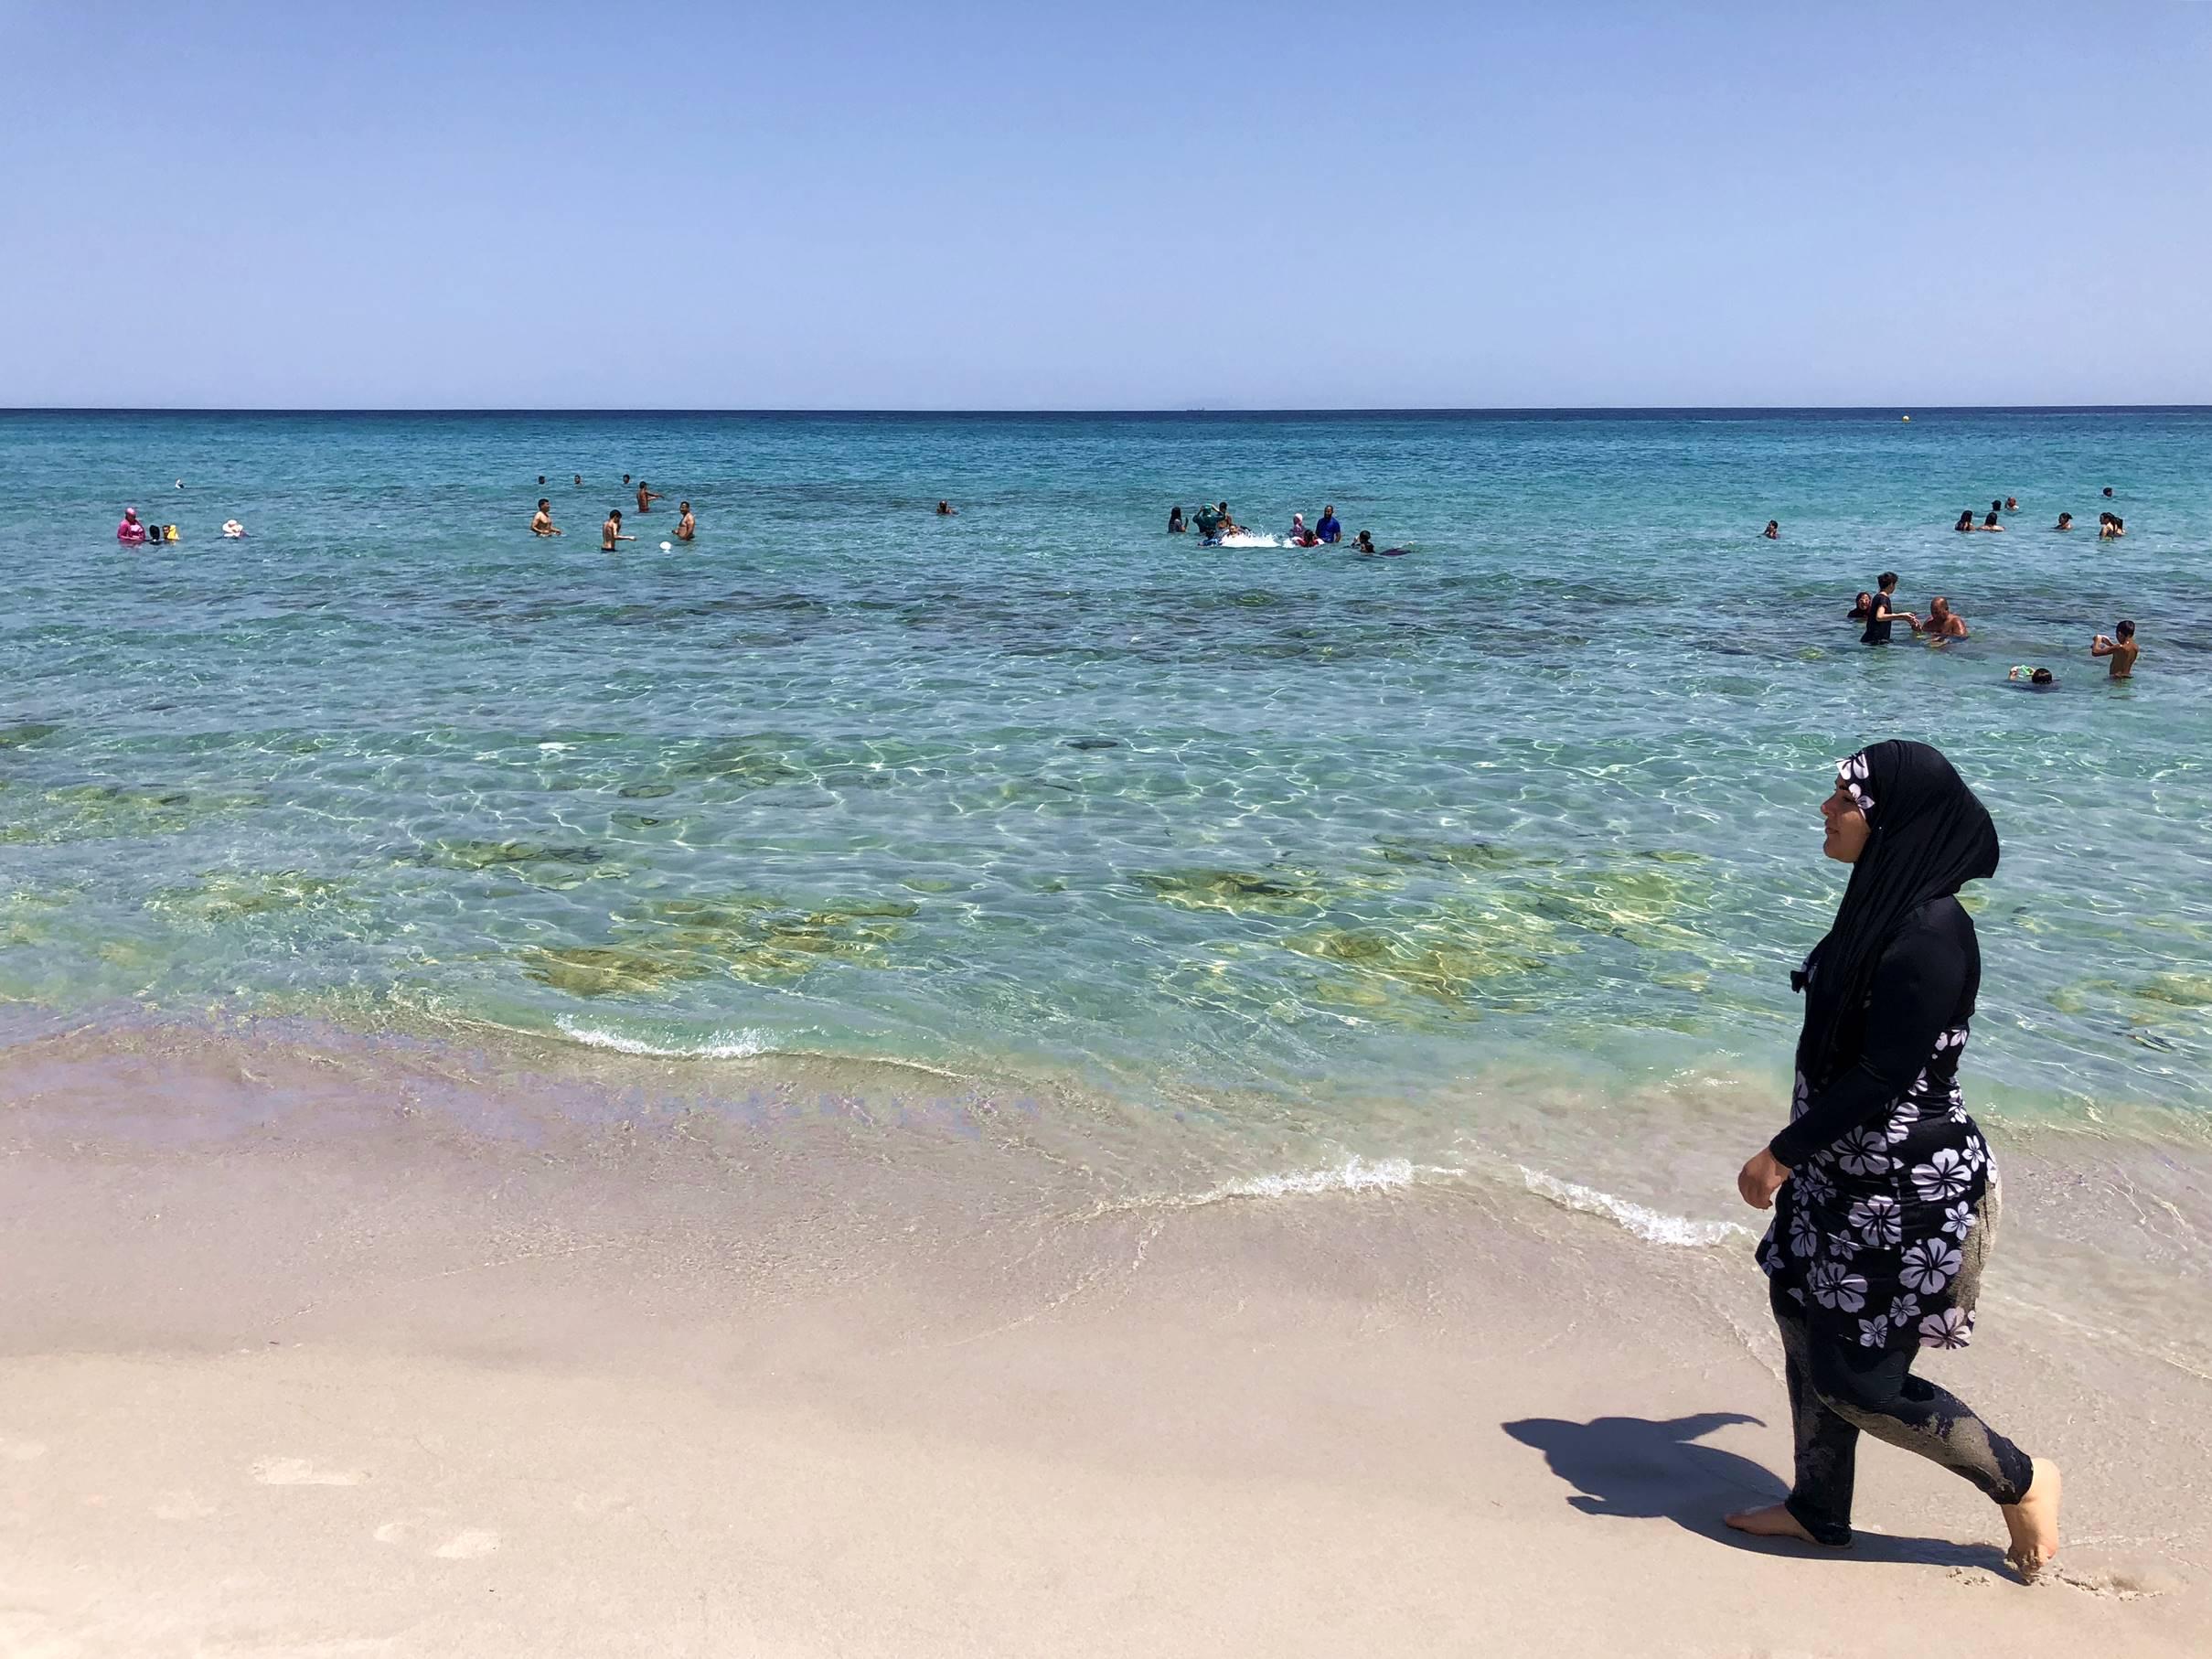 kelibia_tunisia_lamansourah_2